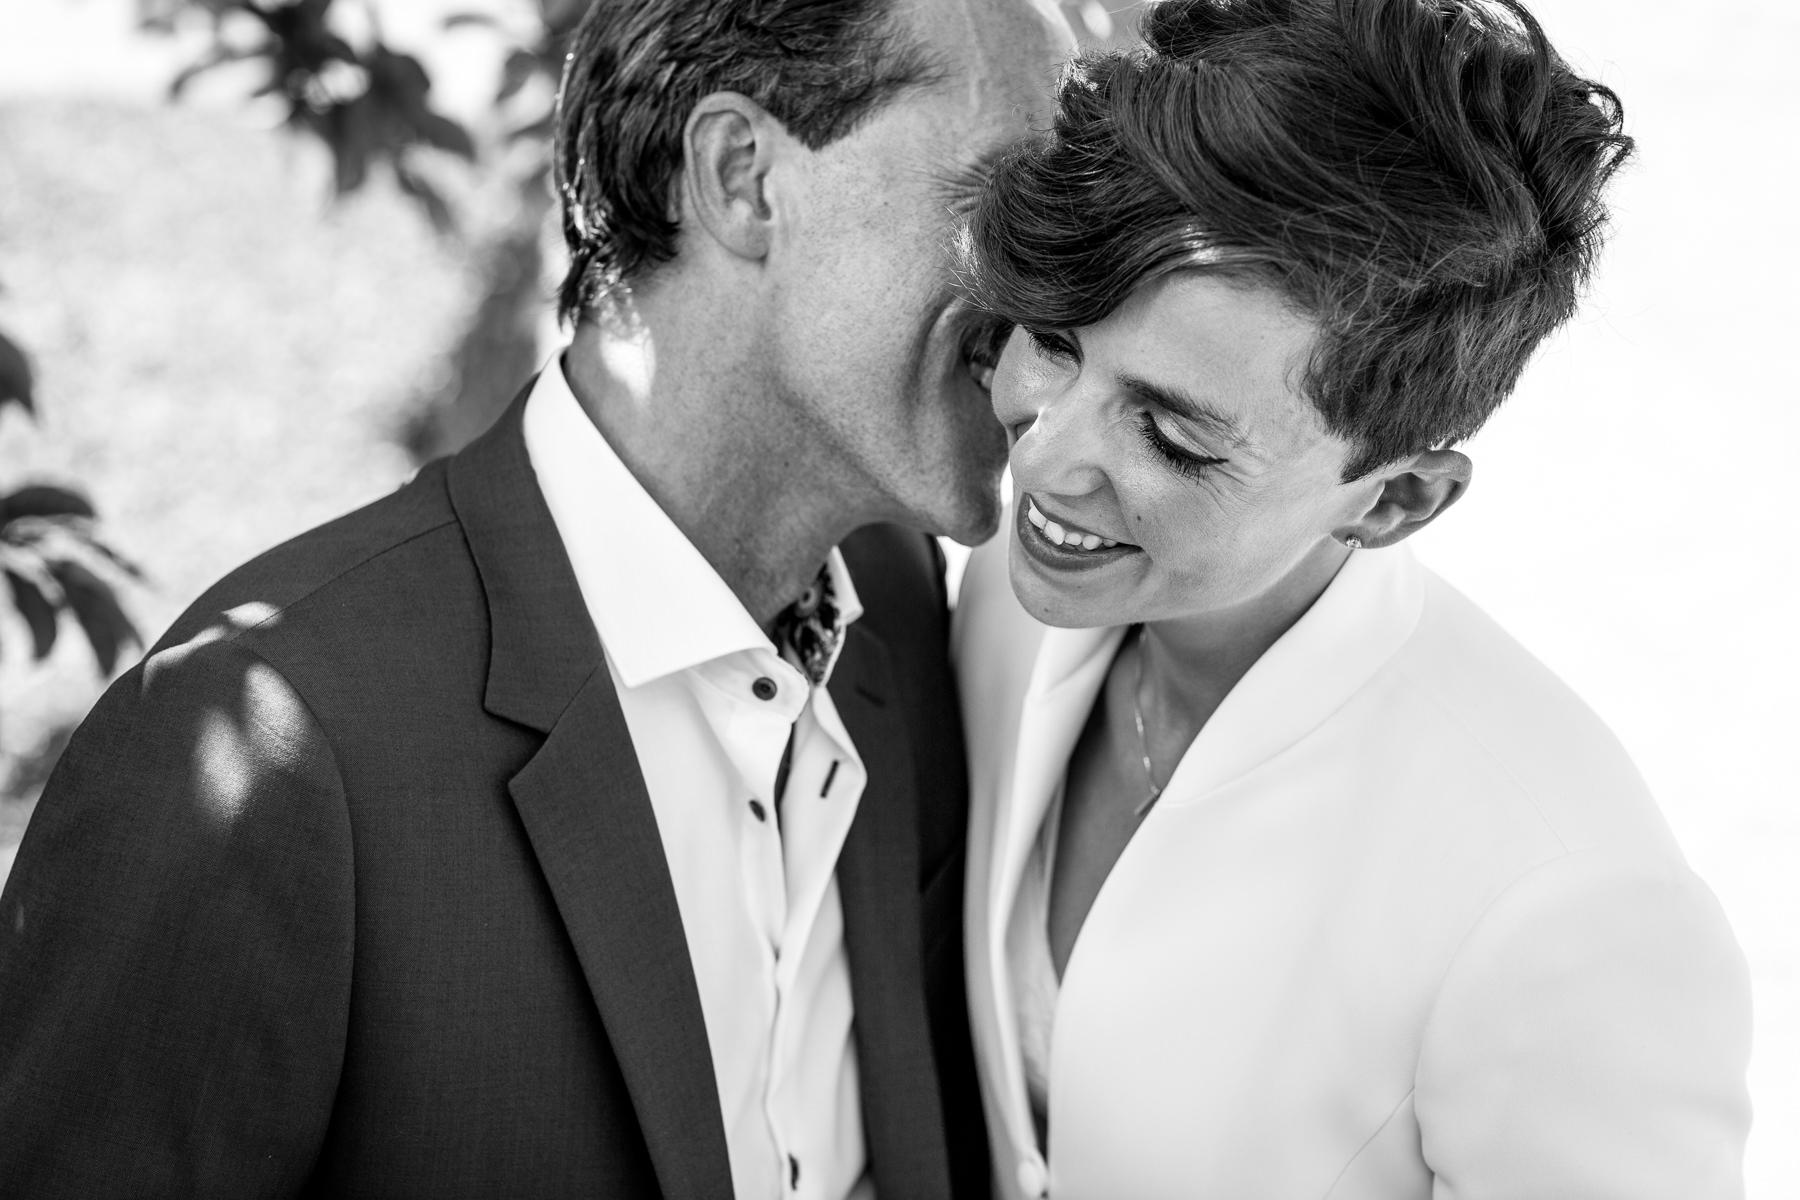 bride groom close-up portrait black&white image smiling embrace natural authentic documentary wedding photo bride groom couple beaverbrook surrey hills leatherhead register office wedding photographer